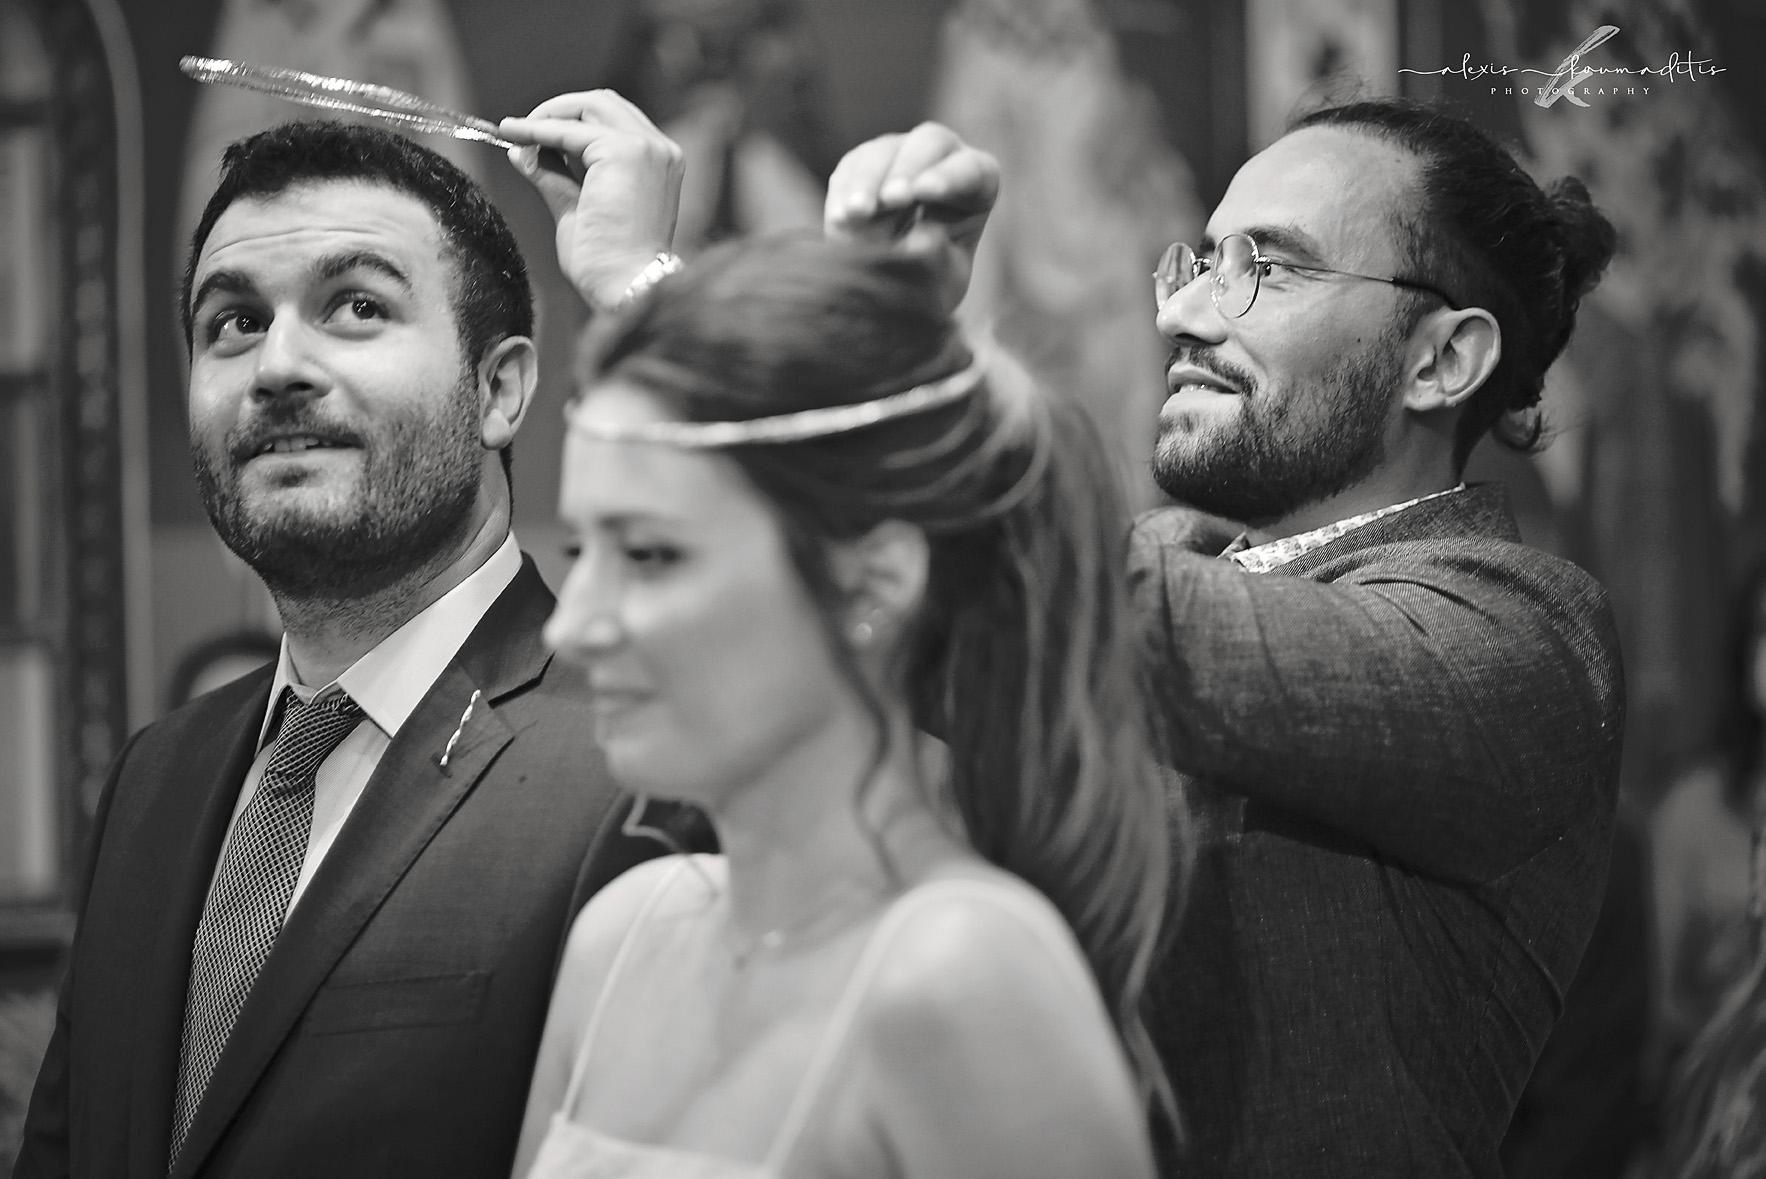 wedding-photography-platamon -love-bride-groom-alexis-koumaditis